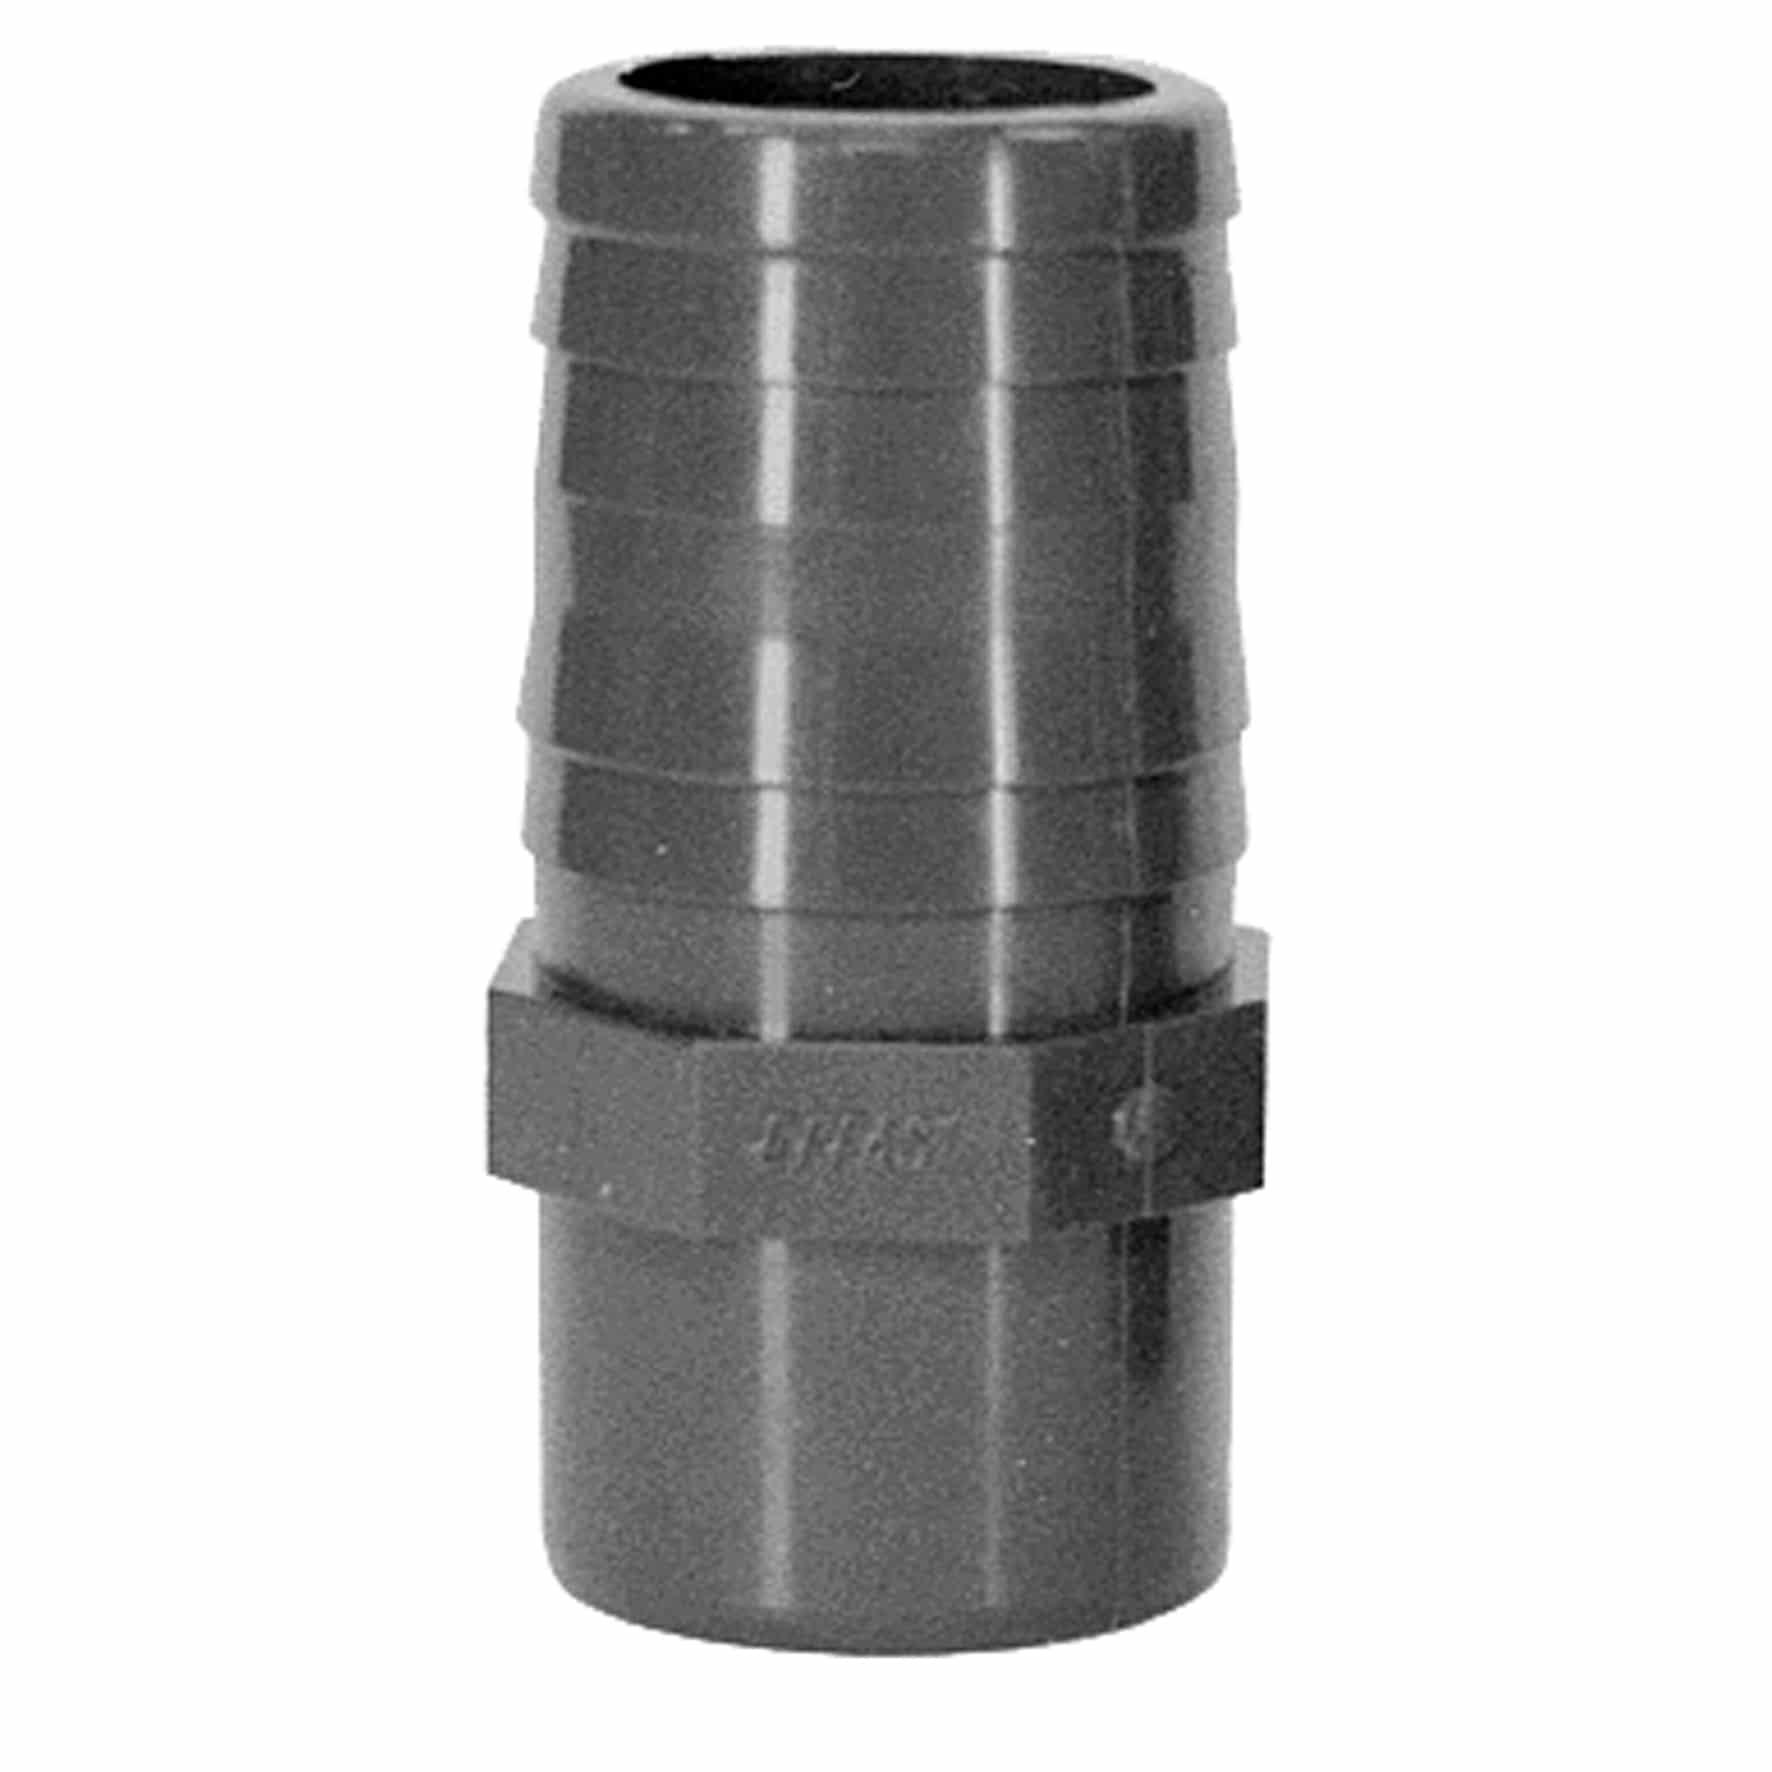 PVC-U Hose adaptor - EFFAST - 100% Made in Italy